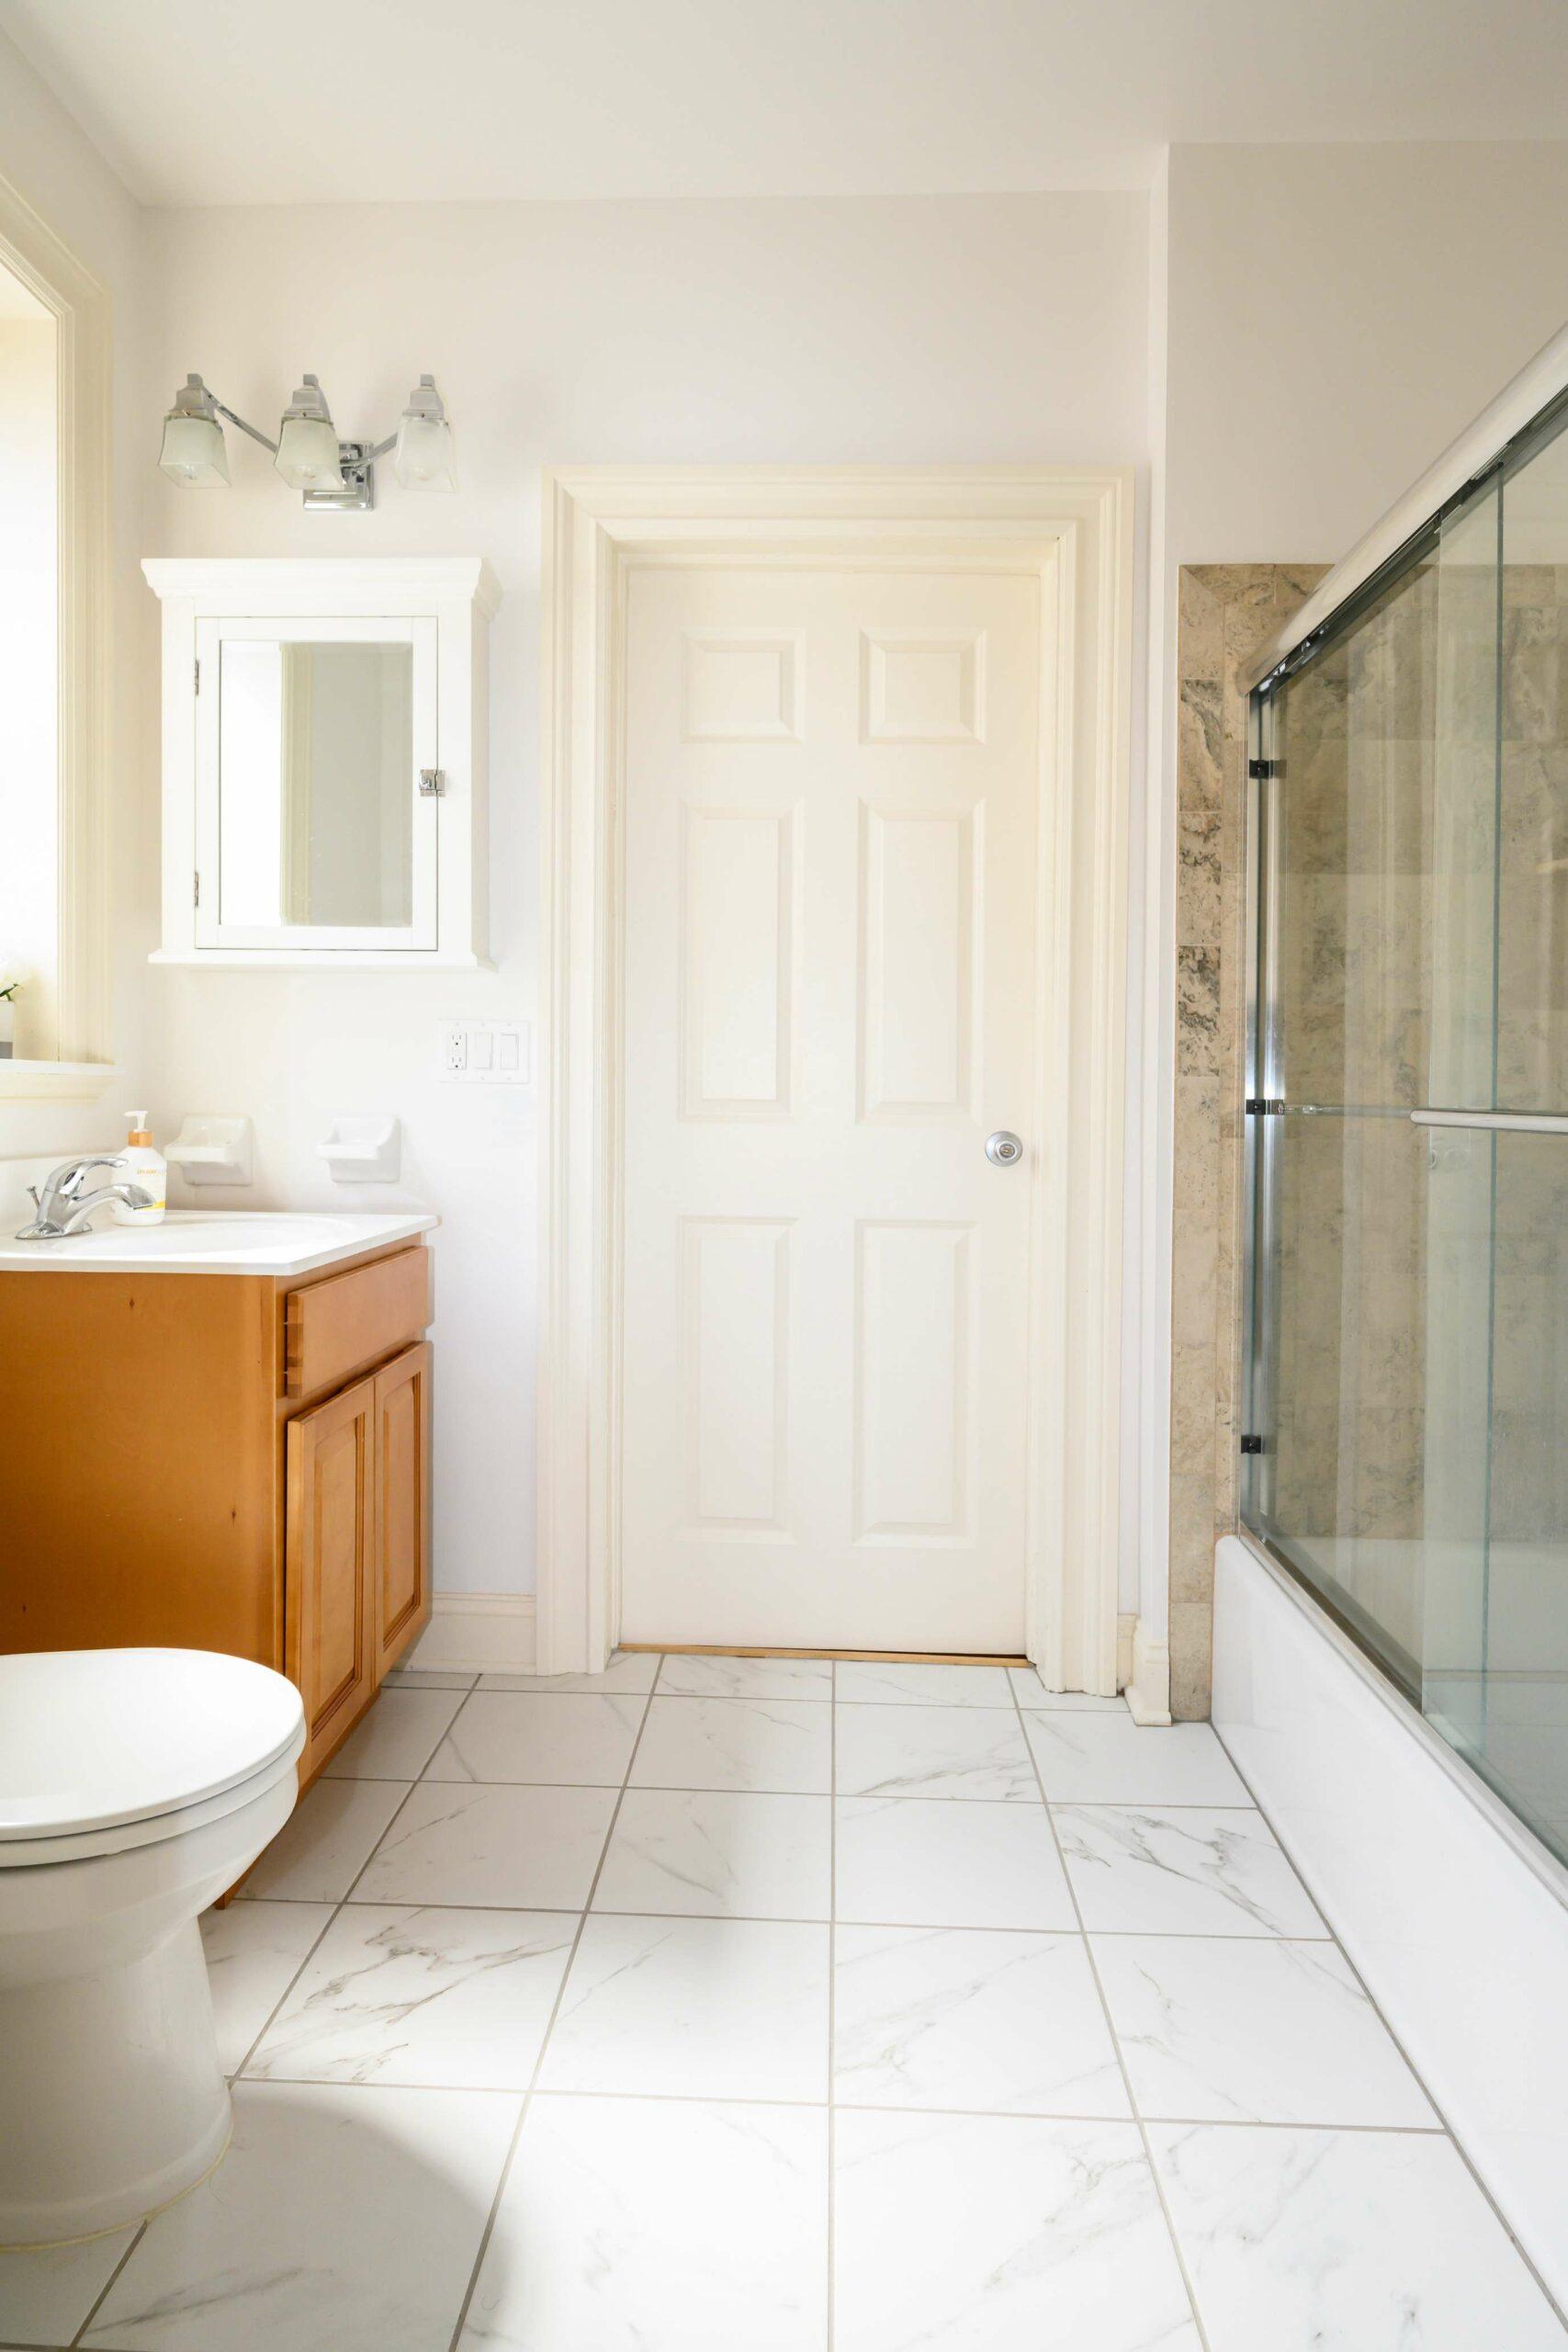 Village House restroom with shower